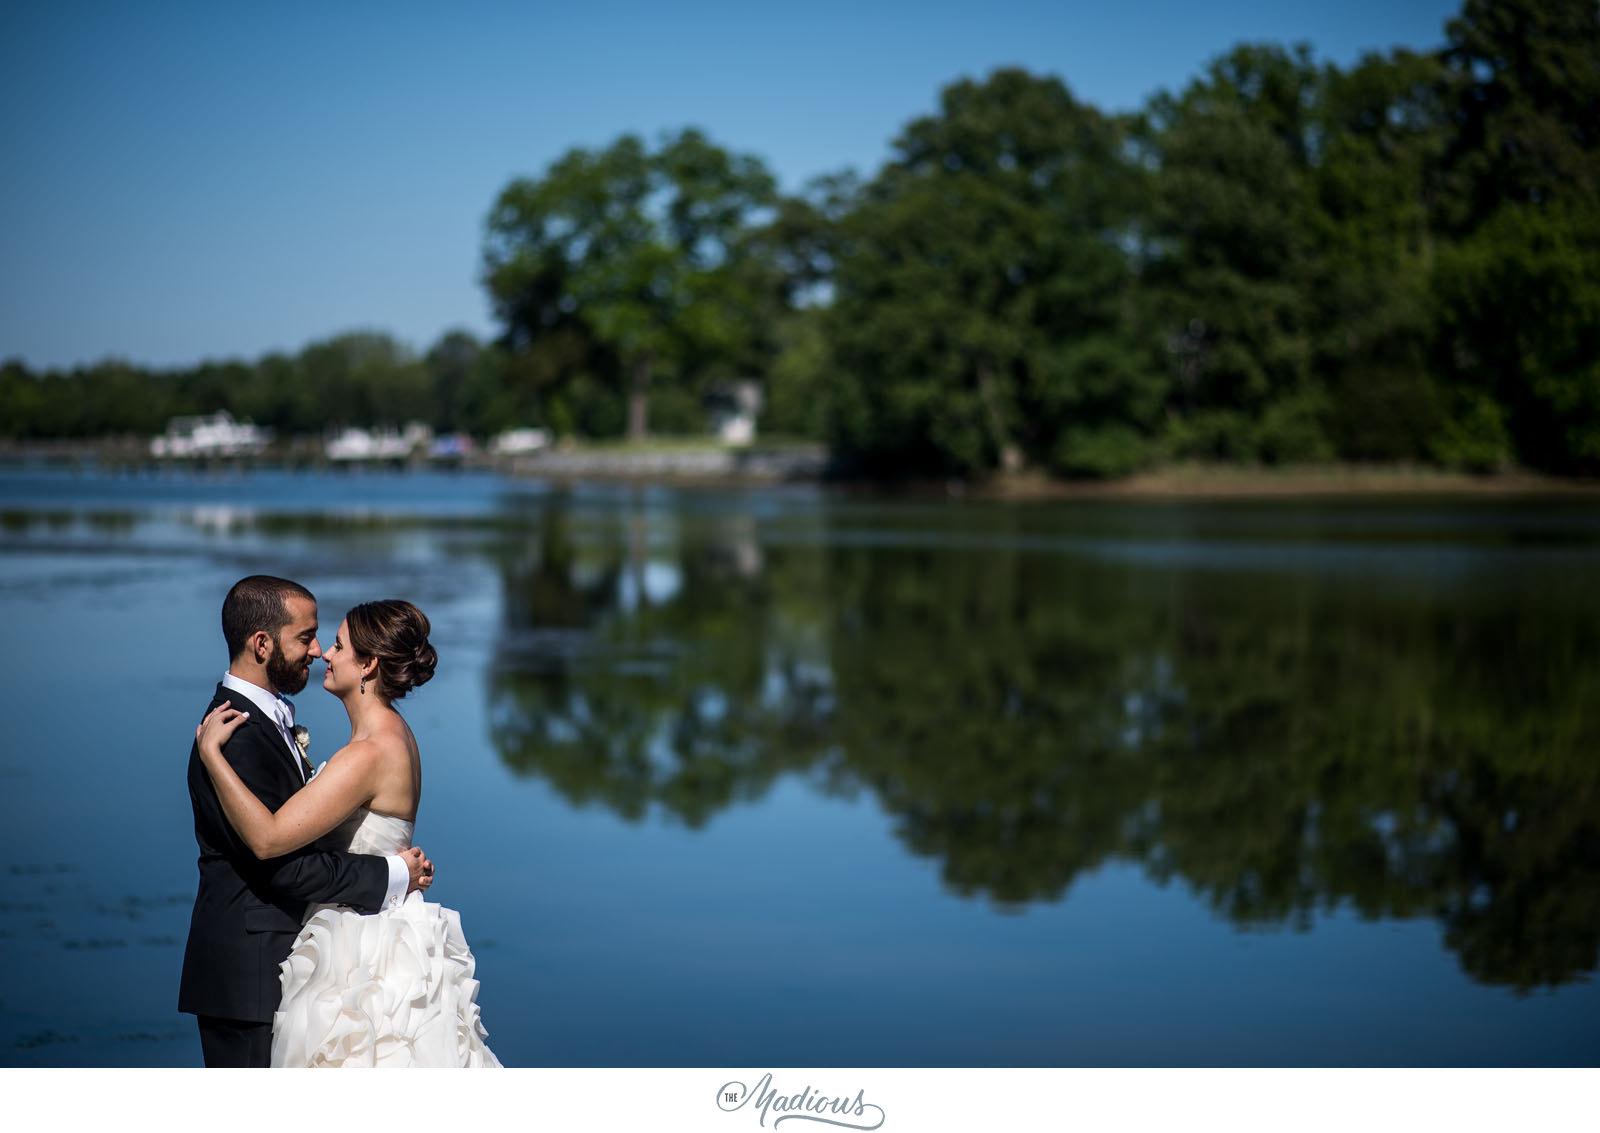 Wedding at The Oaks Waterfront Cristina Scott_013.jpg